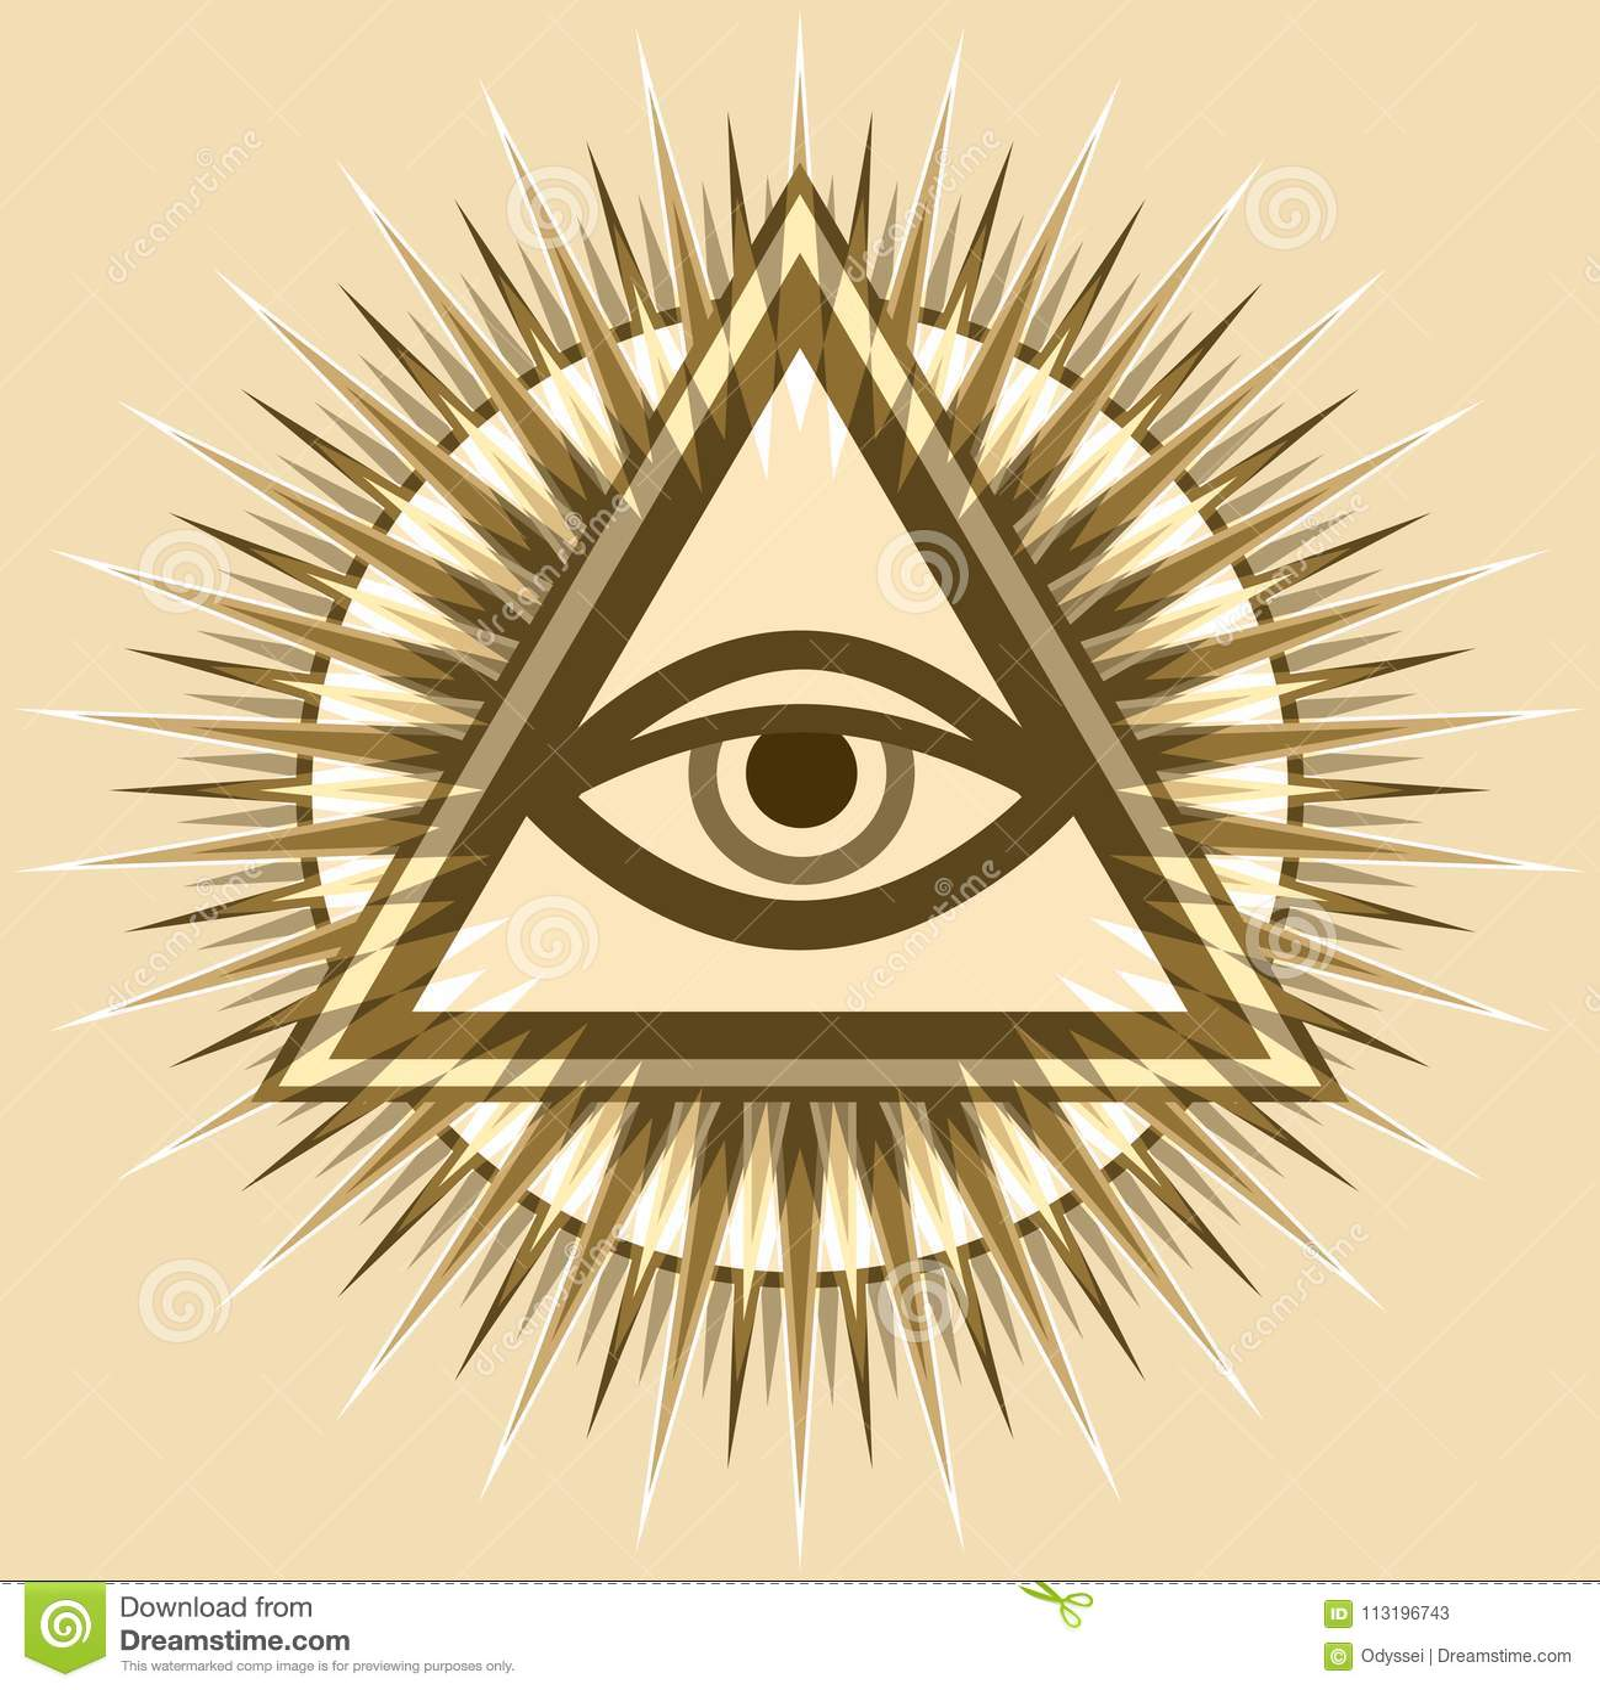 All Seeing Eye The Eye Of Providence Stock Vector Illustration